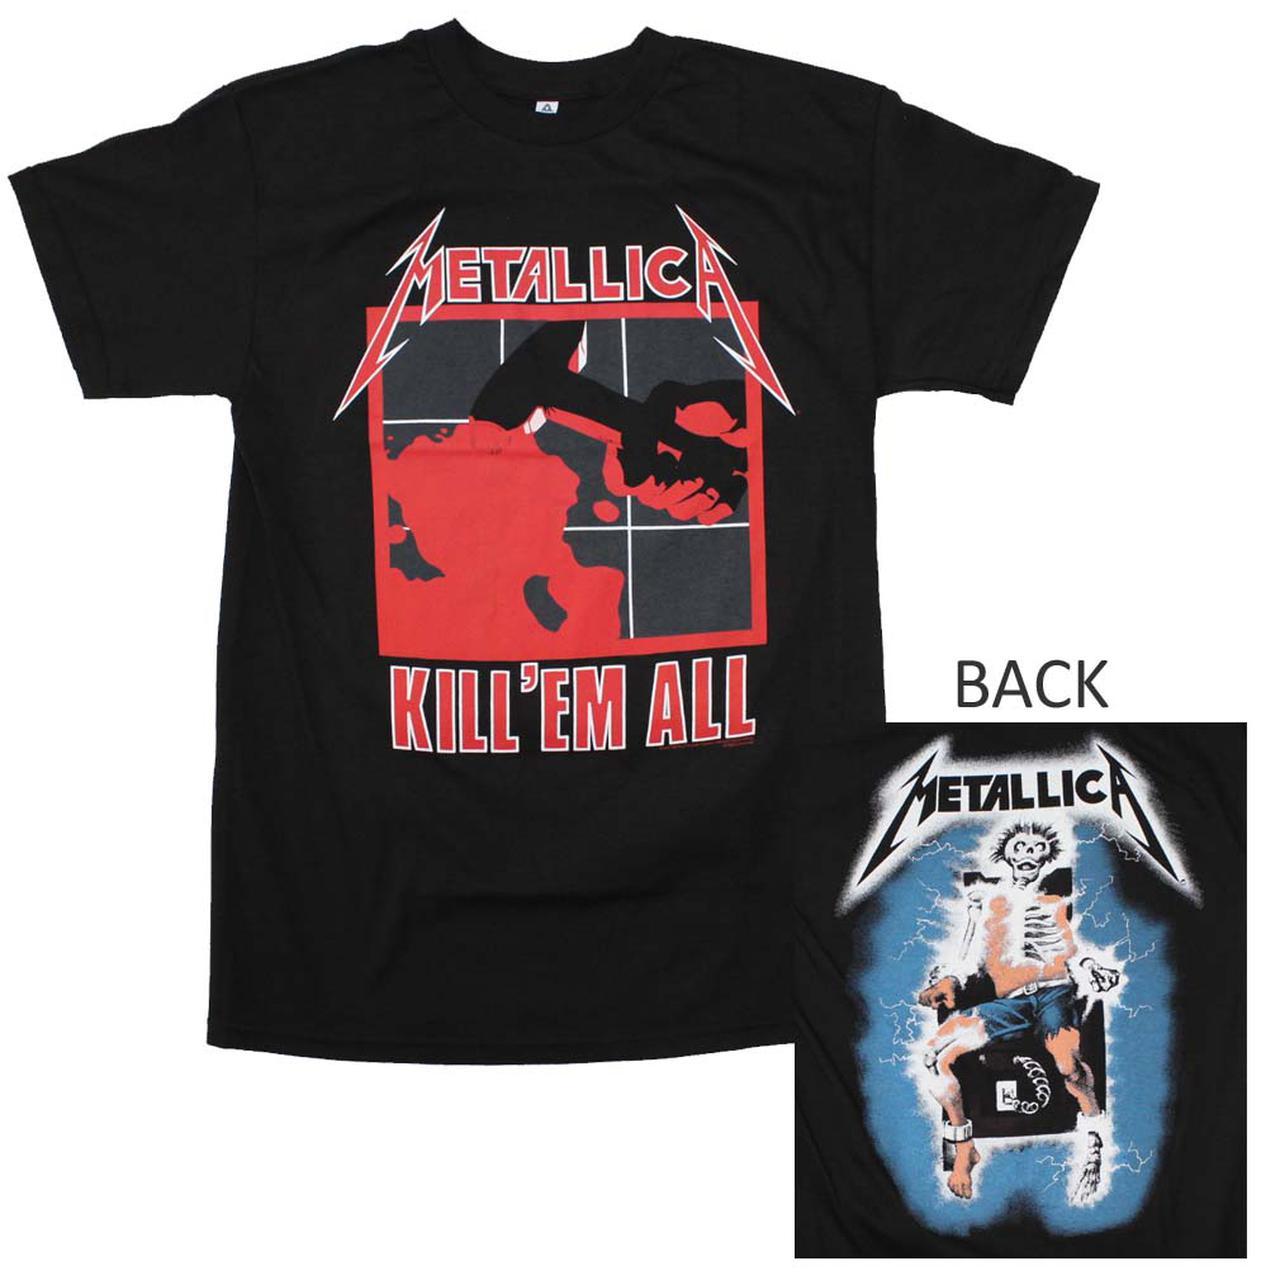 metallica t shirt metallica kill em all t shirt. Black Bedroom Furniture Sets. Home Design Ideas